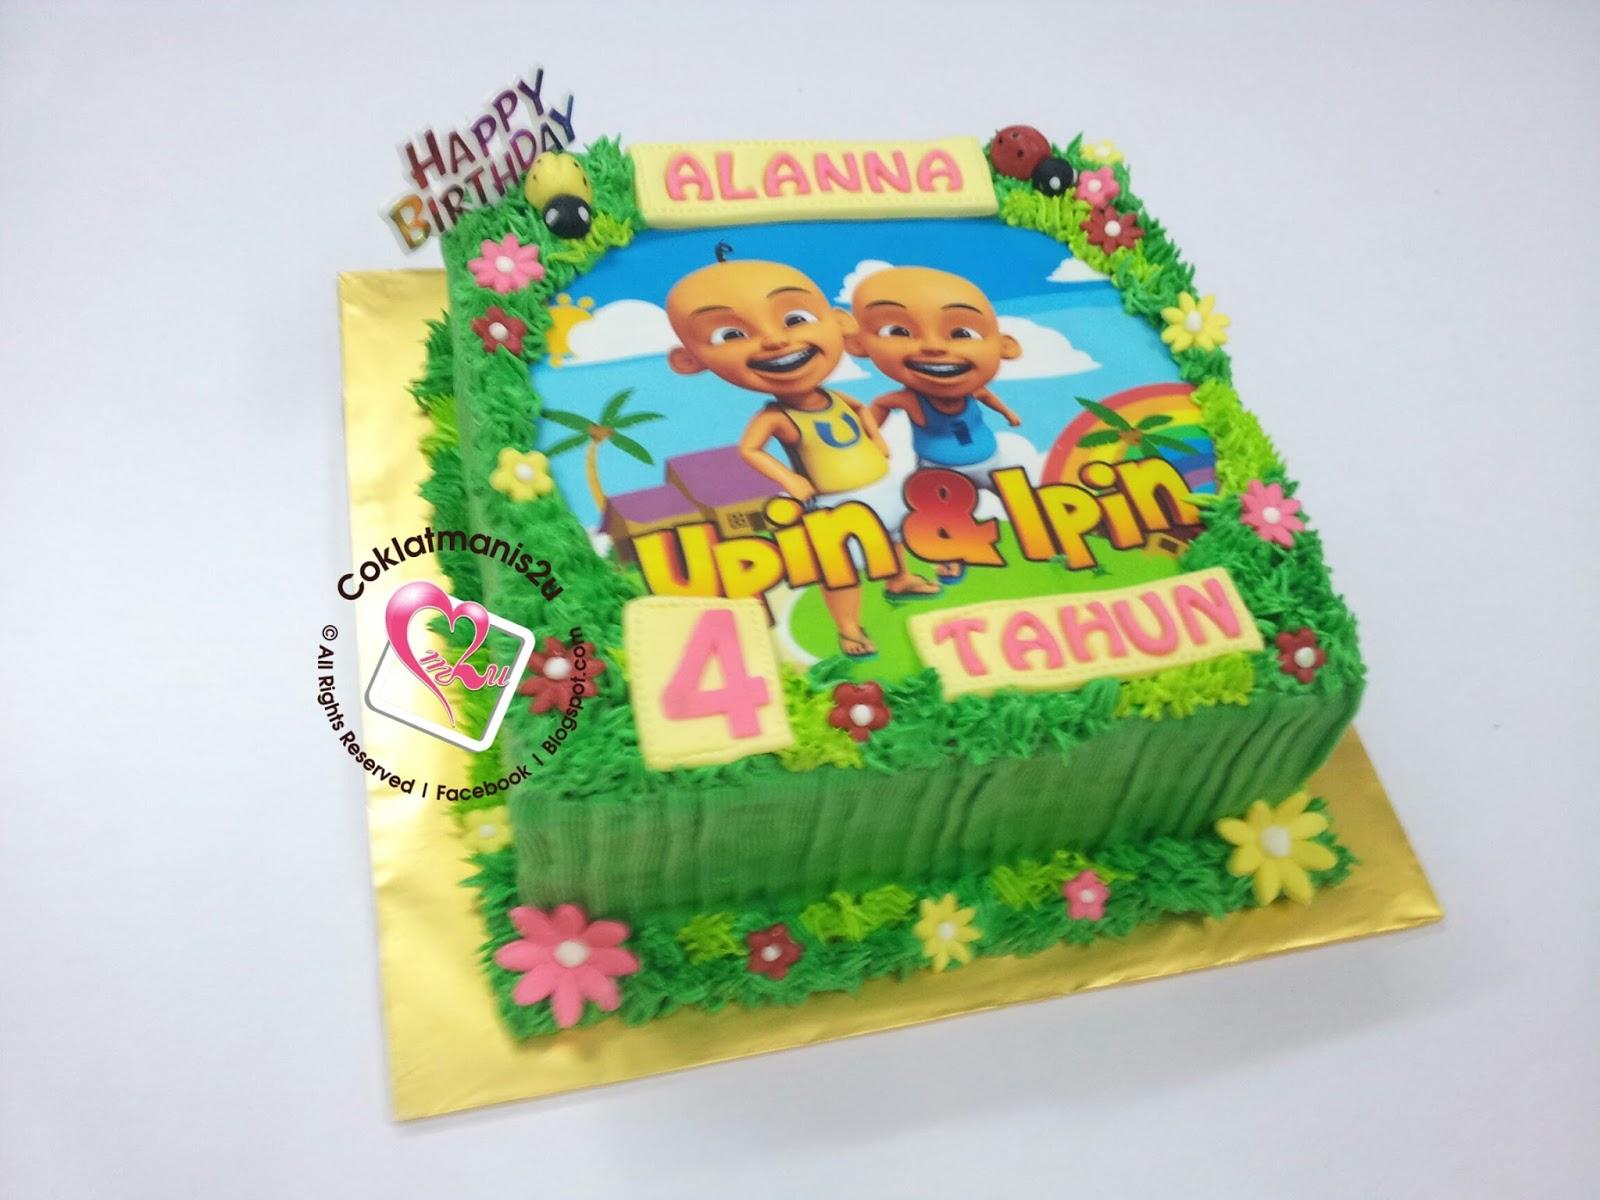 coklatmanis2u Birthday Cake Edible Image Upin Ipin